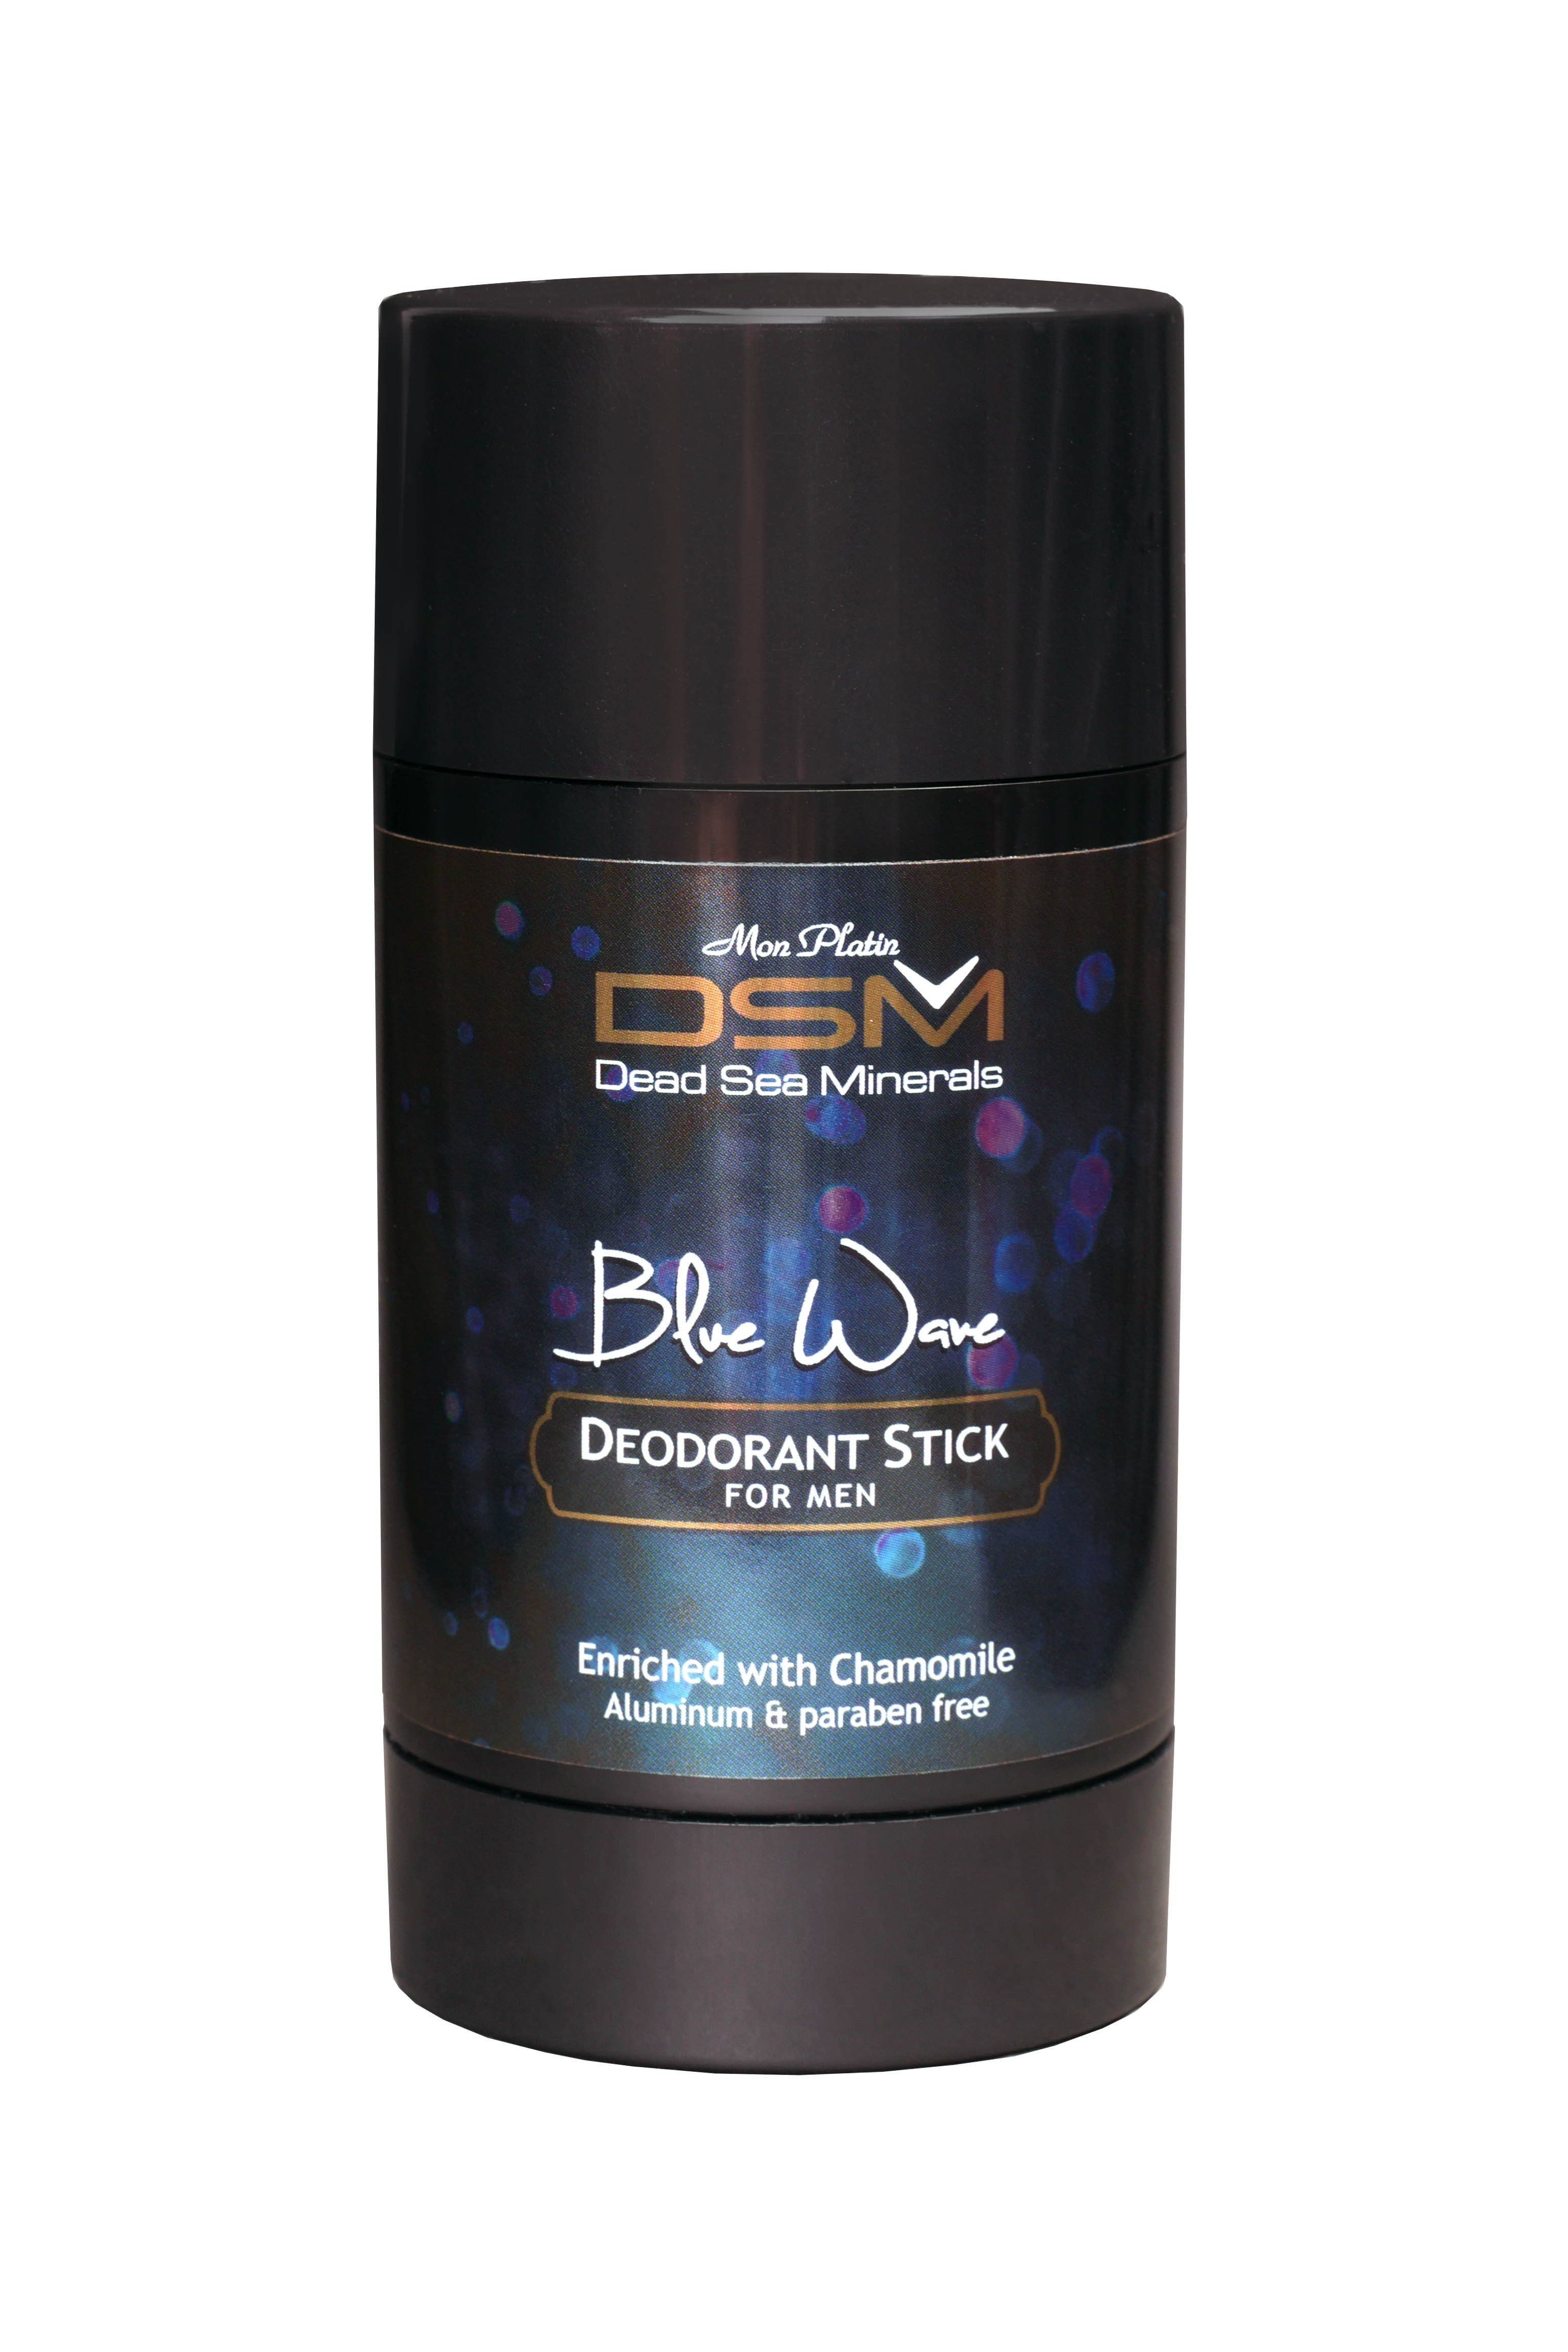 Deodorant Stick For Men - Blue Wave